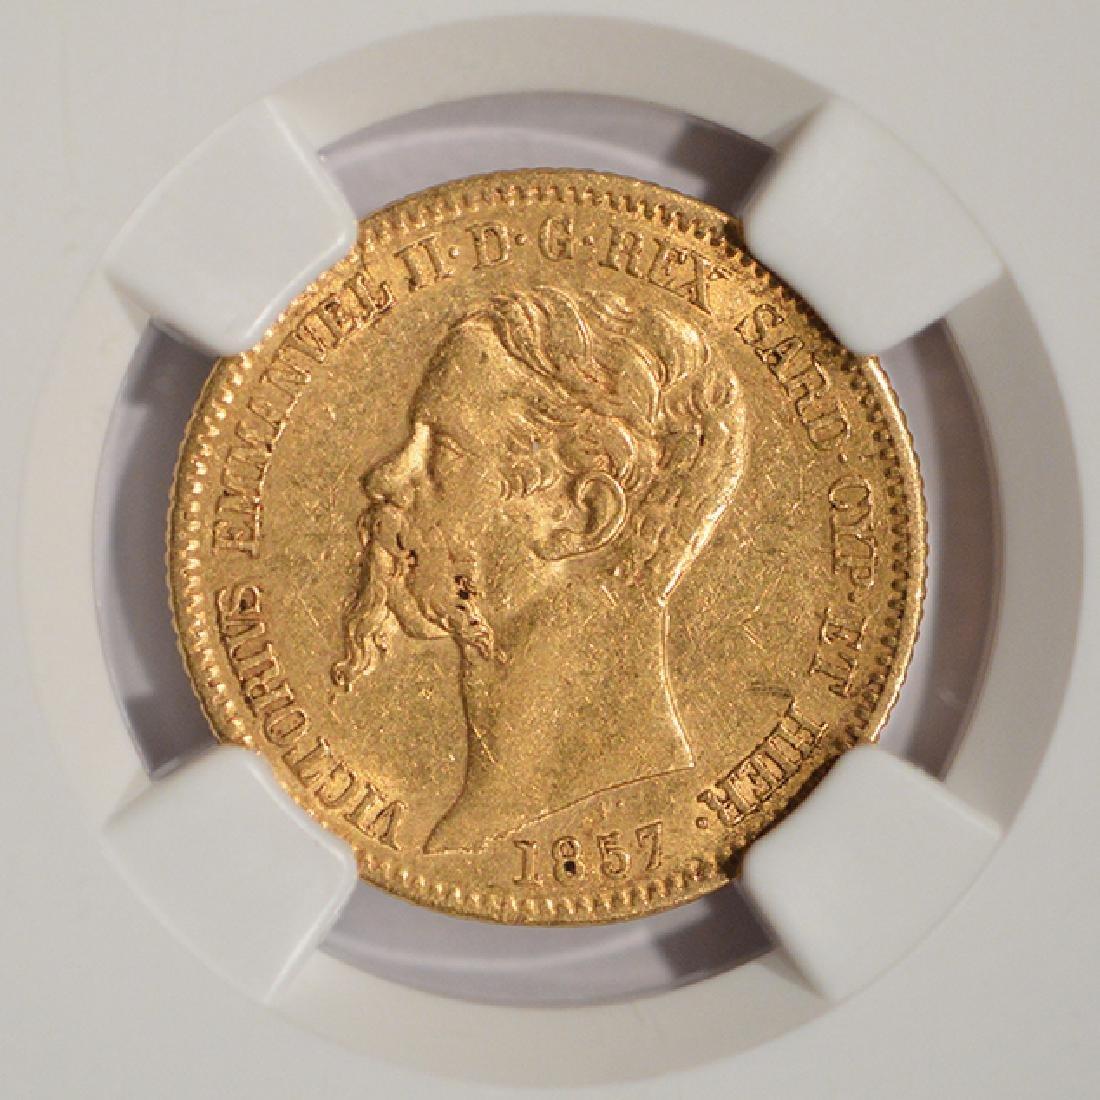 1857 Eagle B Italy 20 Lire Gold Coin NGC AU55 - 3